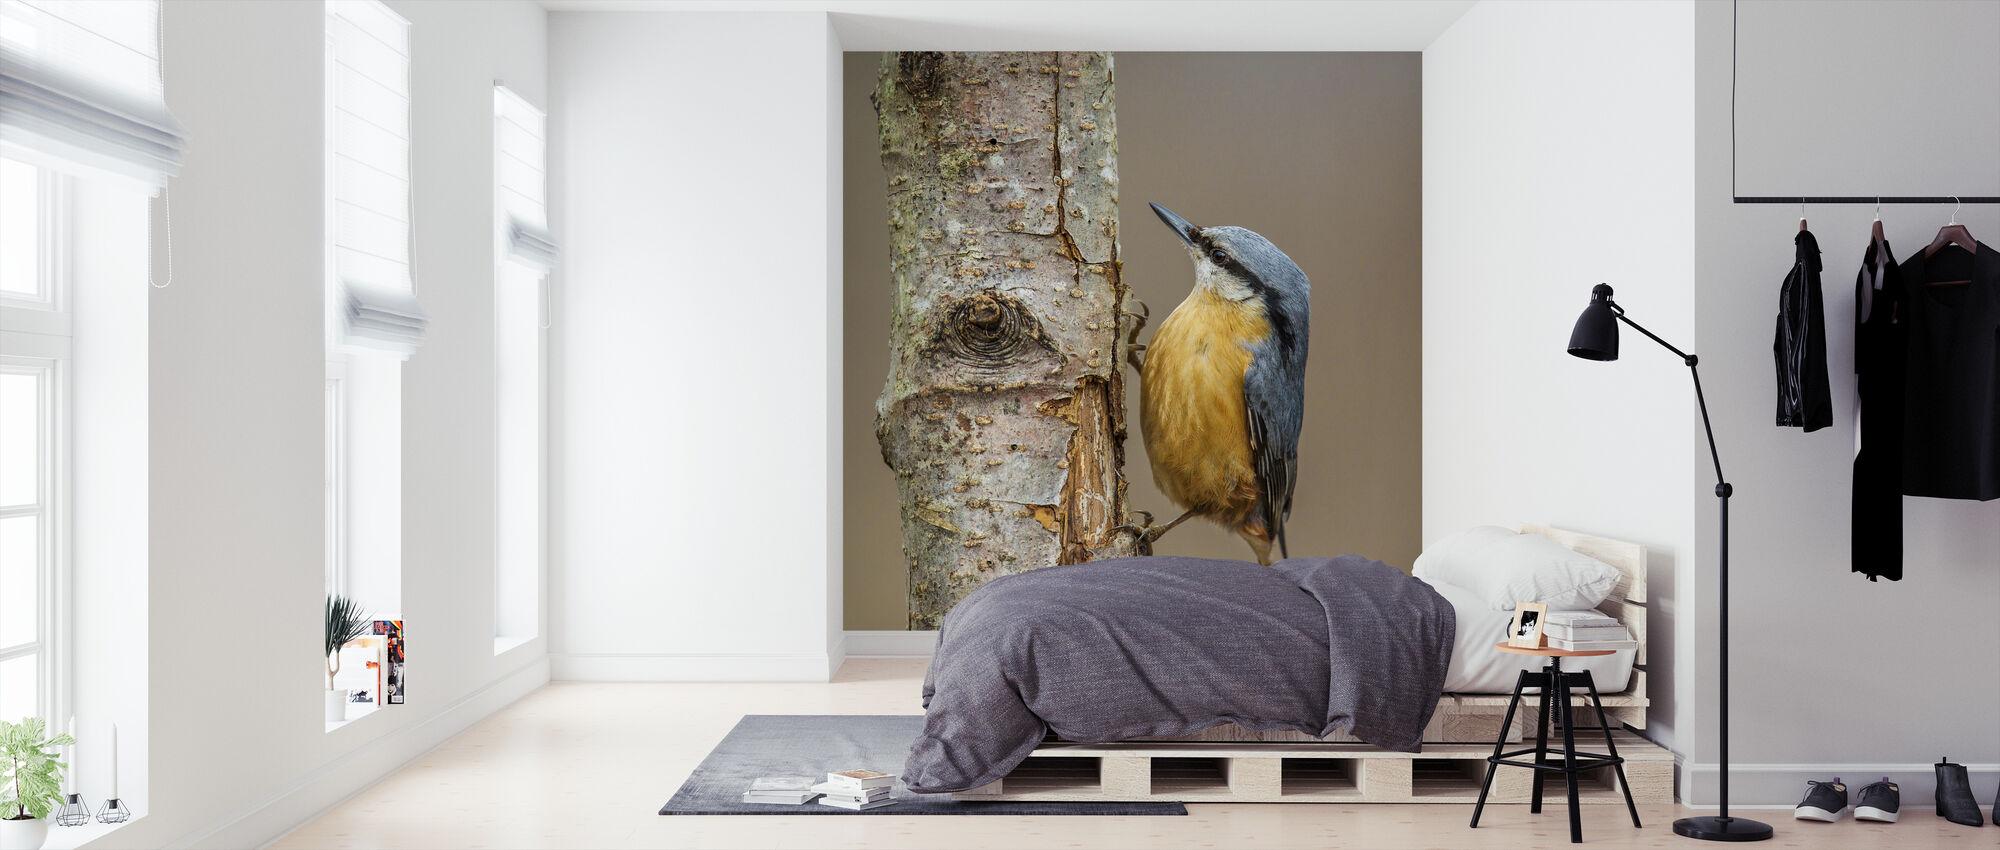 Knuppel Voeding - Behang - Slaapkamer